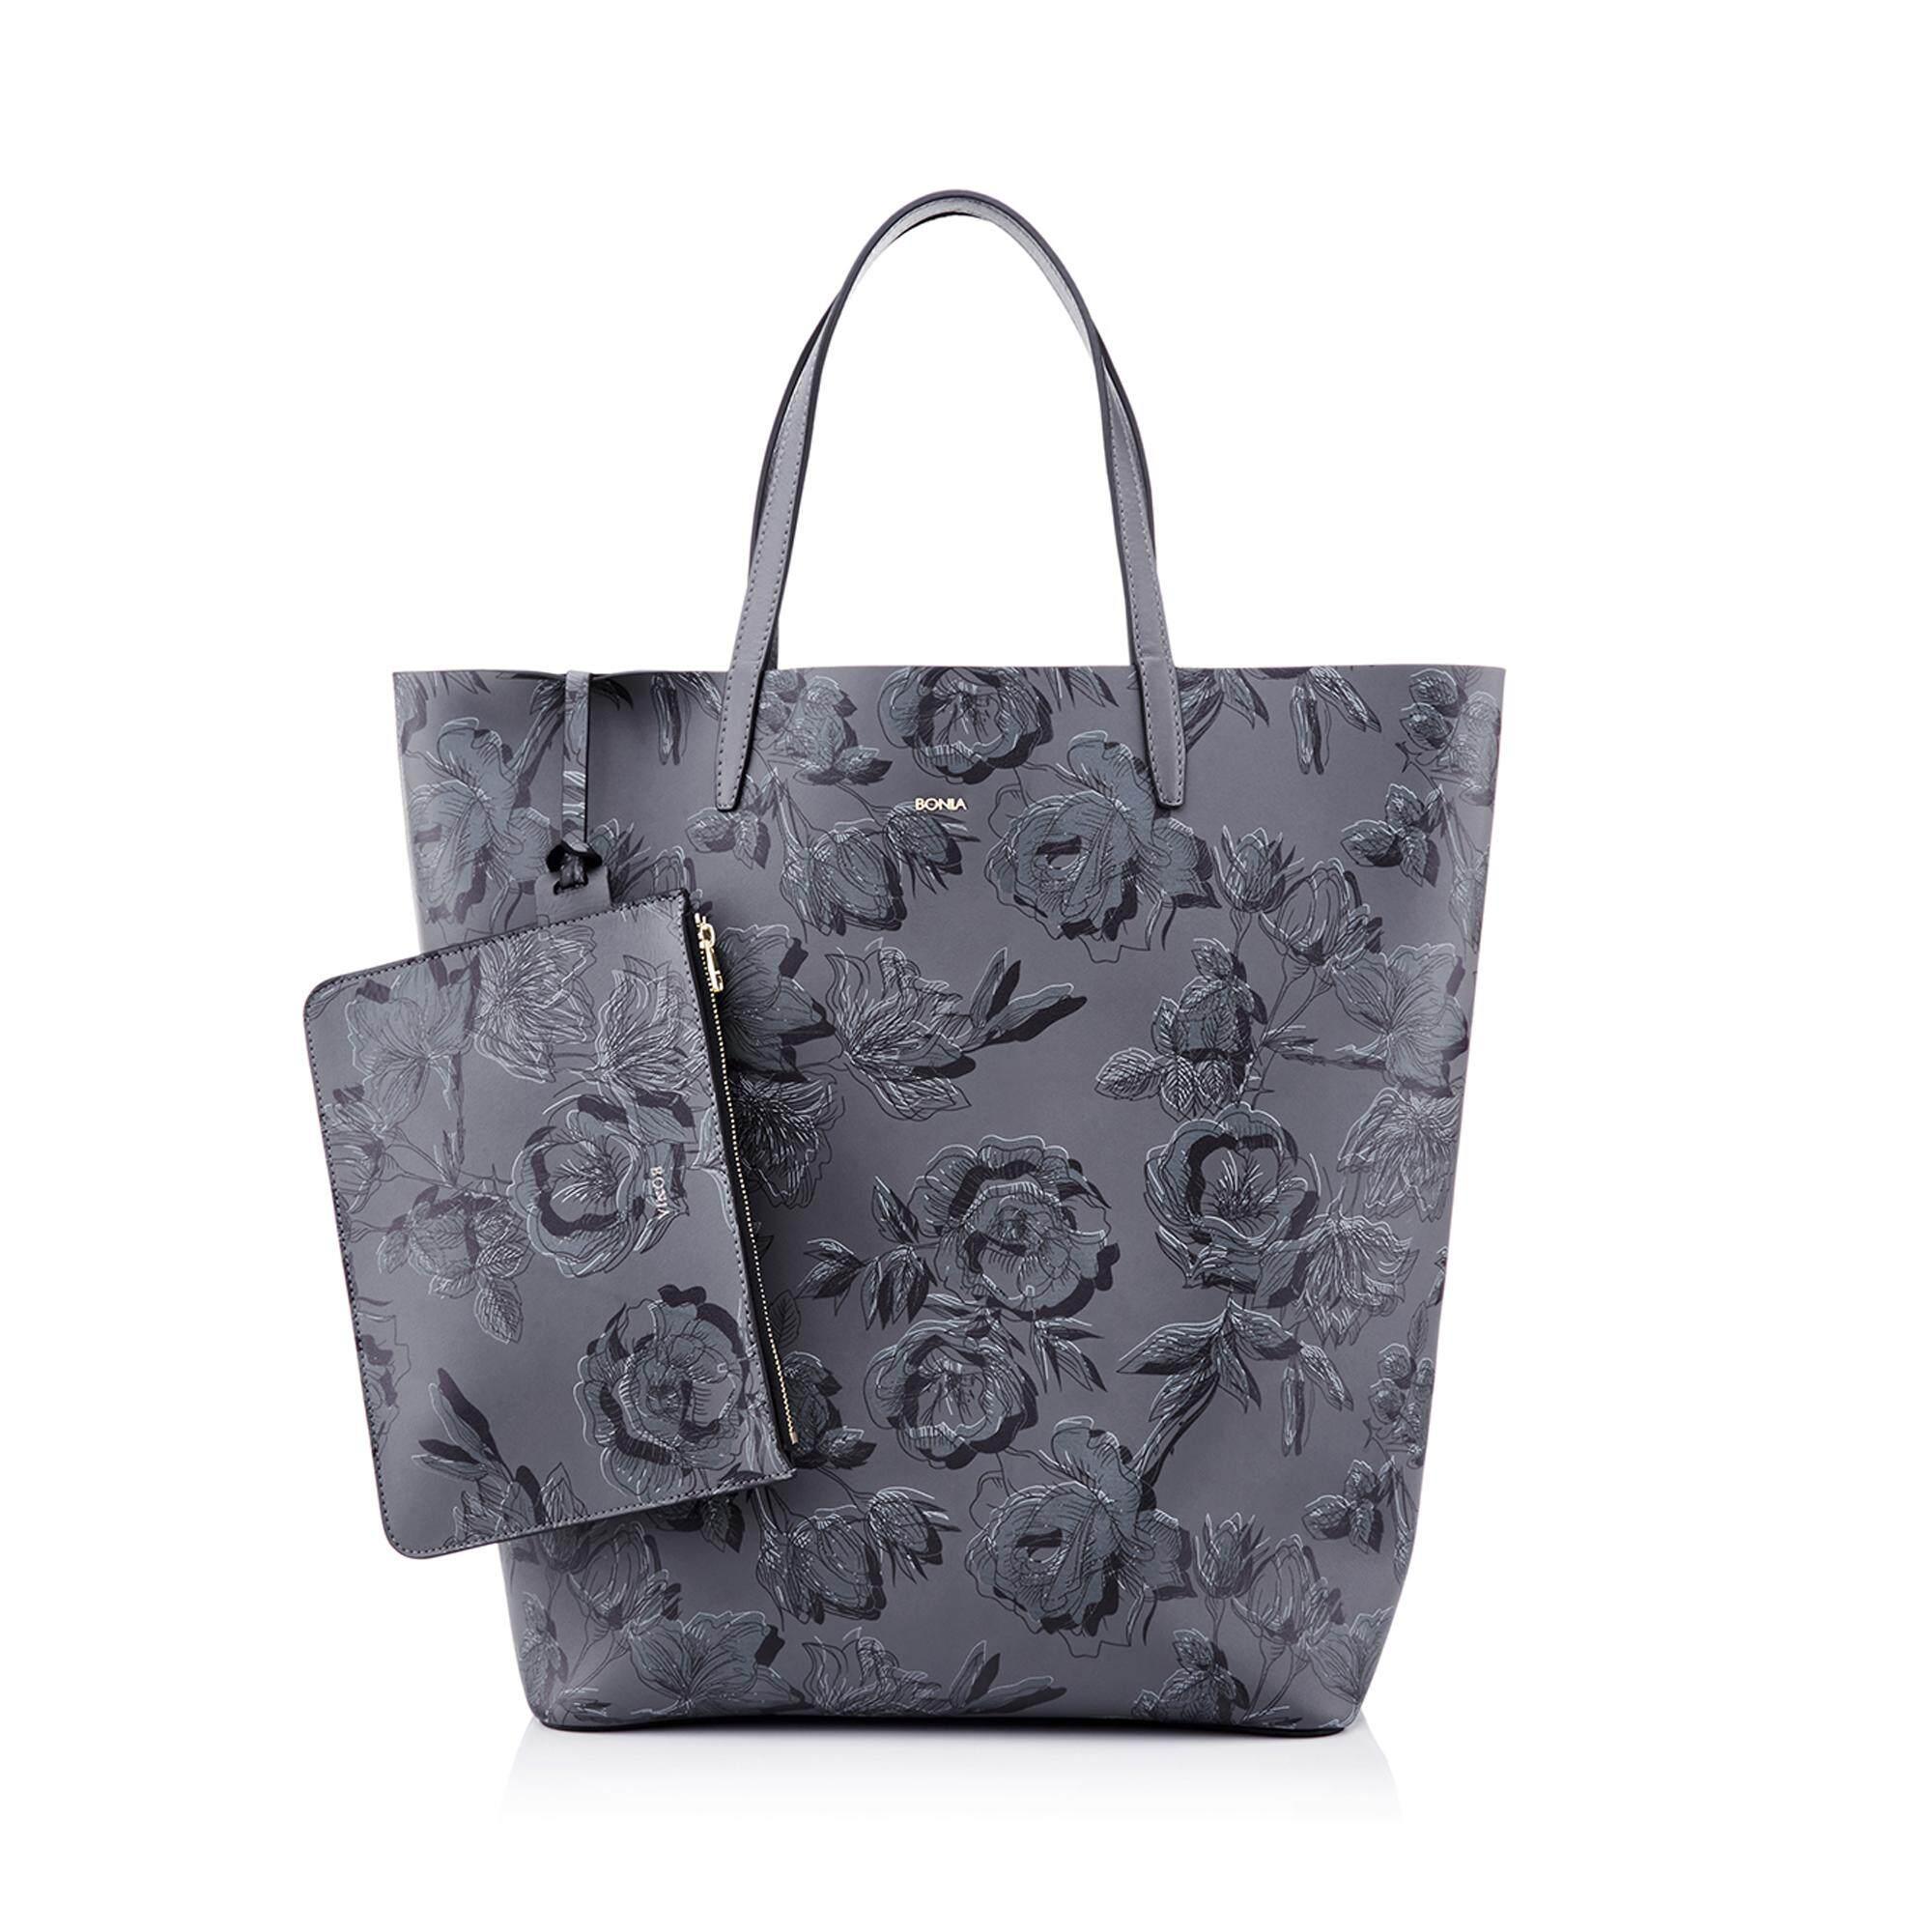 Bonia Women Bags price in Malaysia - Best Bonia Women Bags  9f9ddb1488